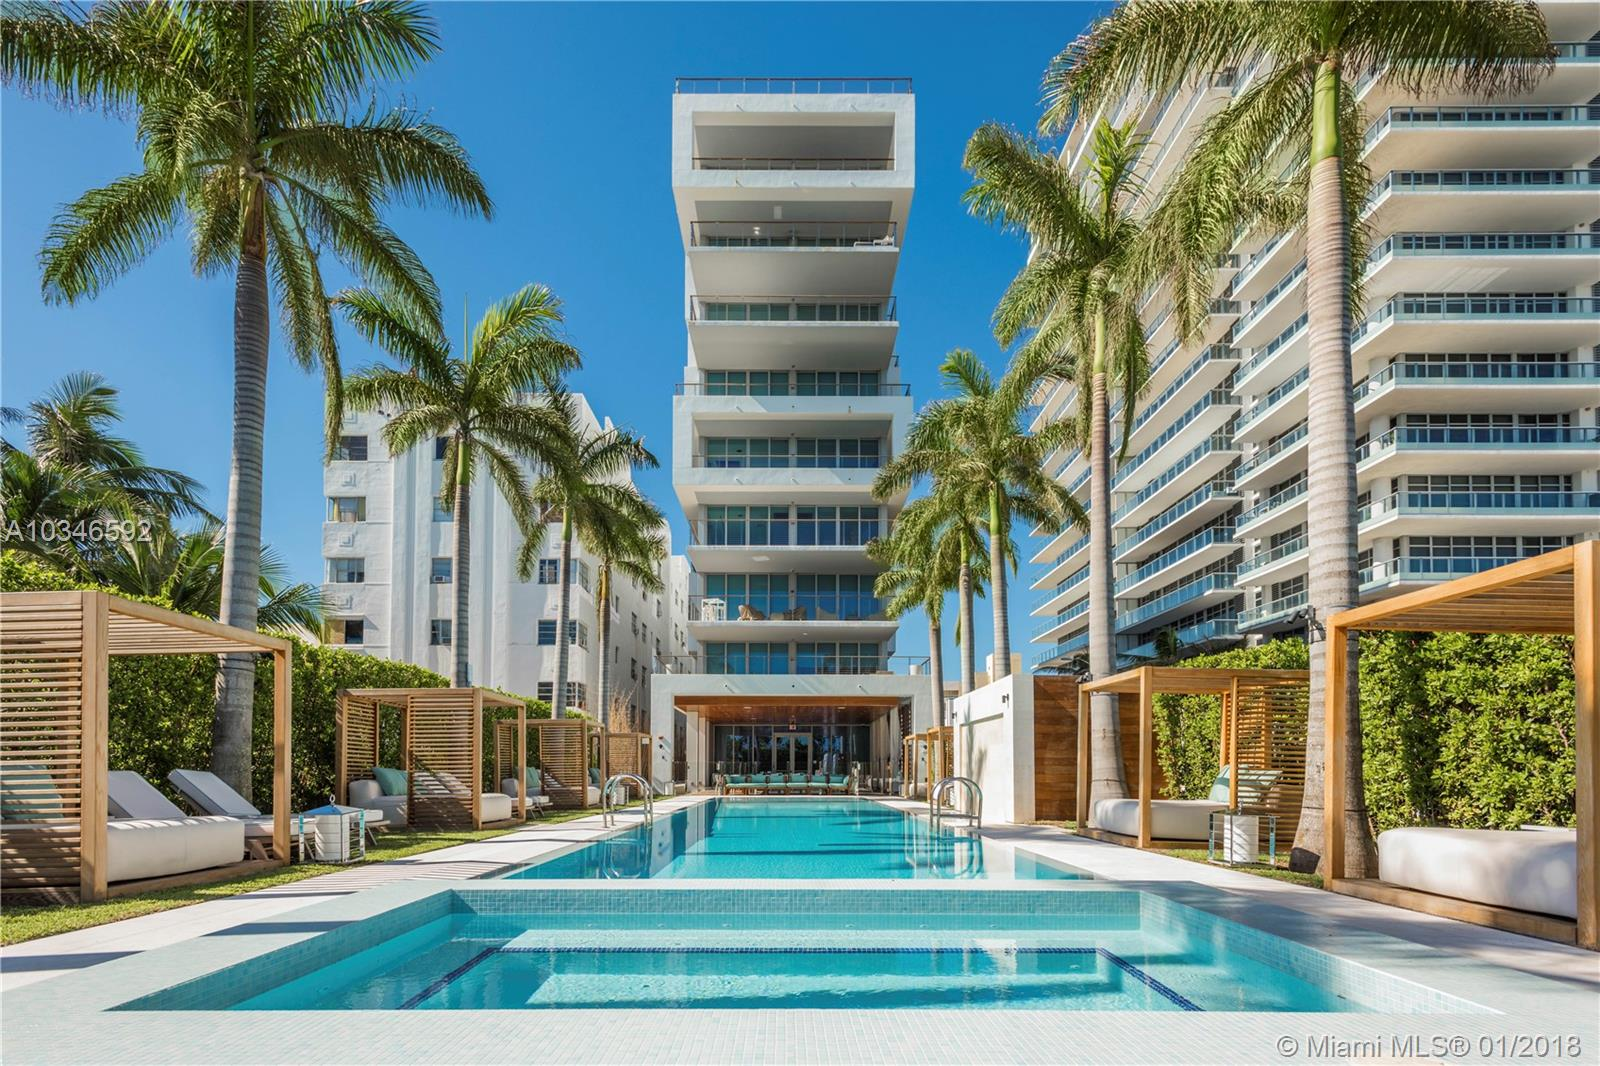 miami beach penthouses sobe luxury homes. Black Bedroom Furniture Sets. Home Design Ideas